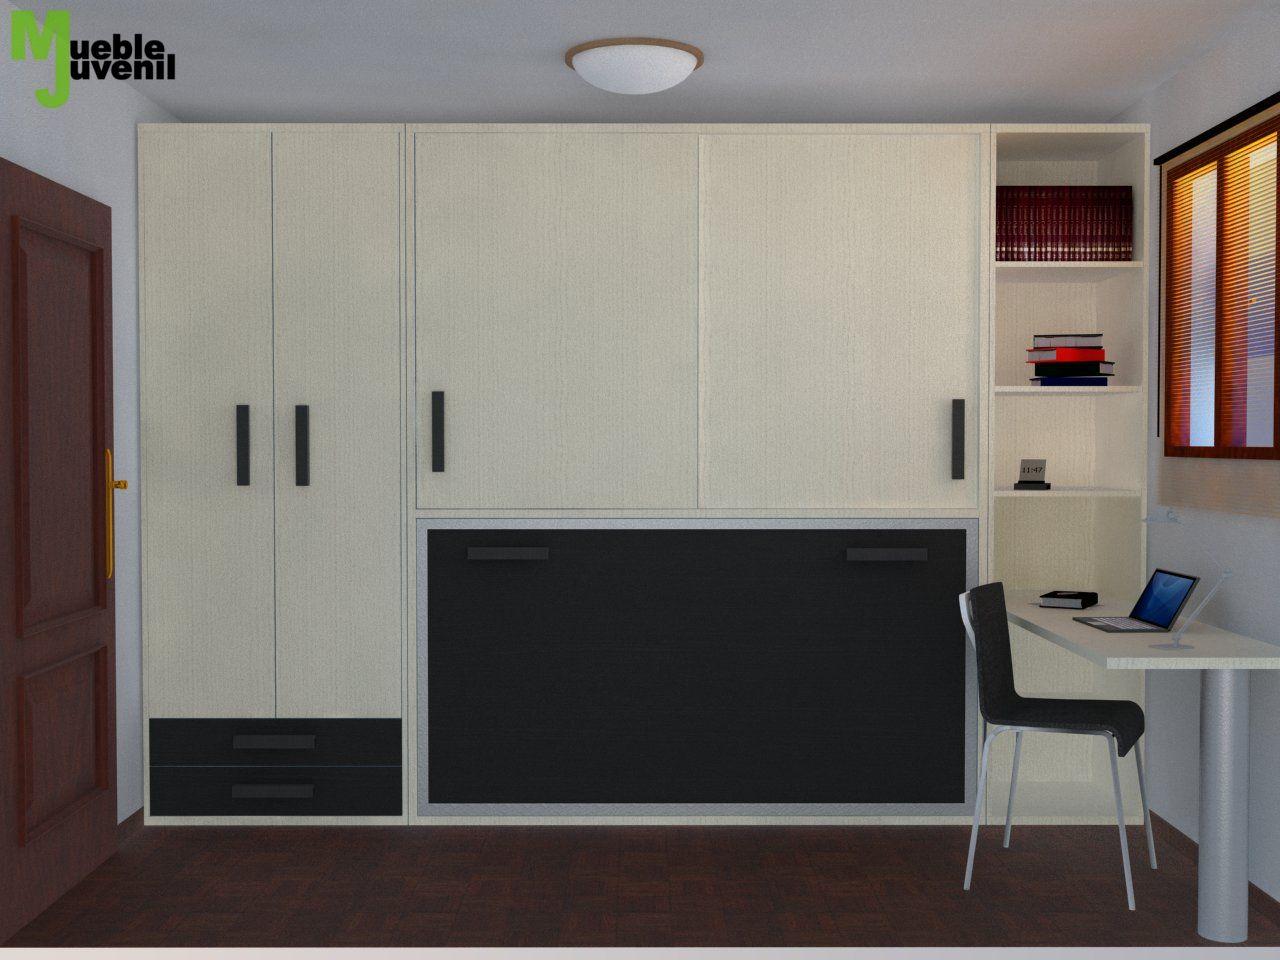 Diseo De Habitacion Juvenil Dormitorio Juvenil Moderno Diseo De  # Muebles Juveniles Kuu